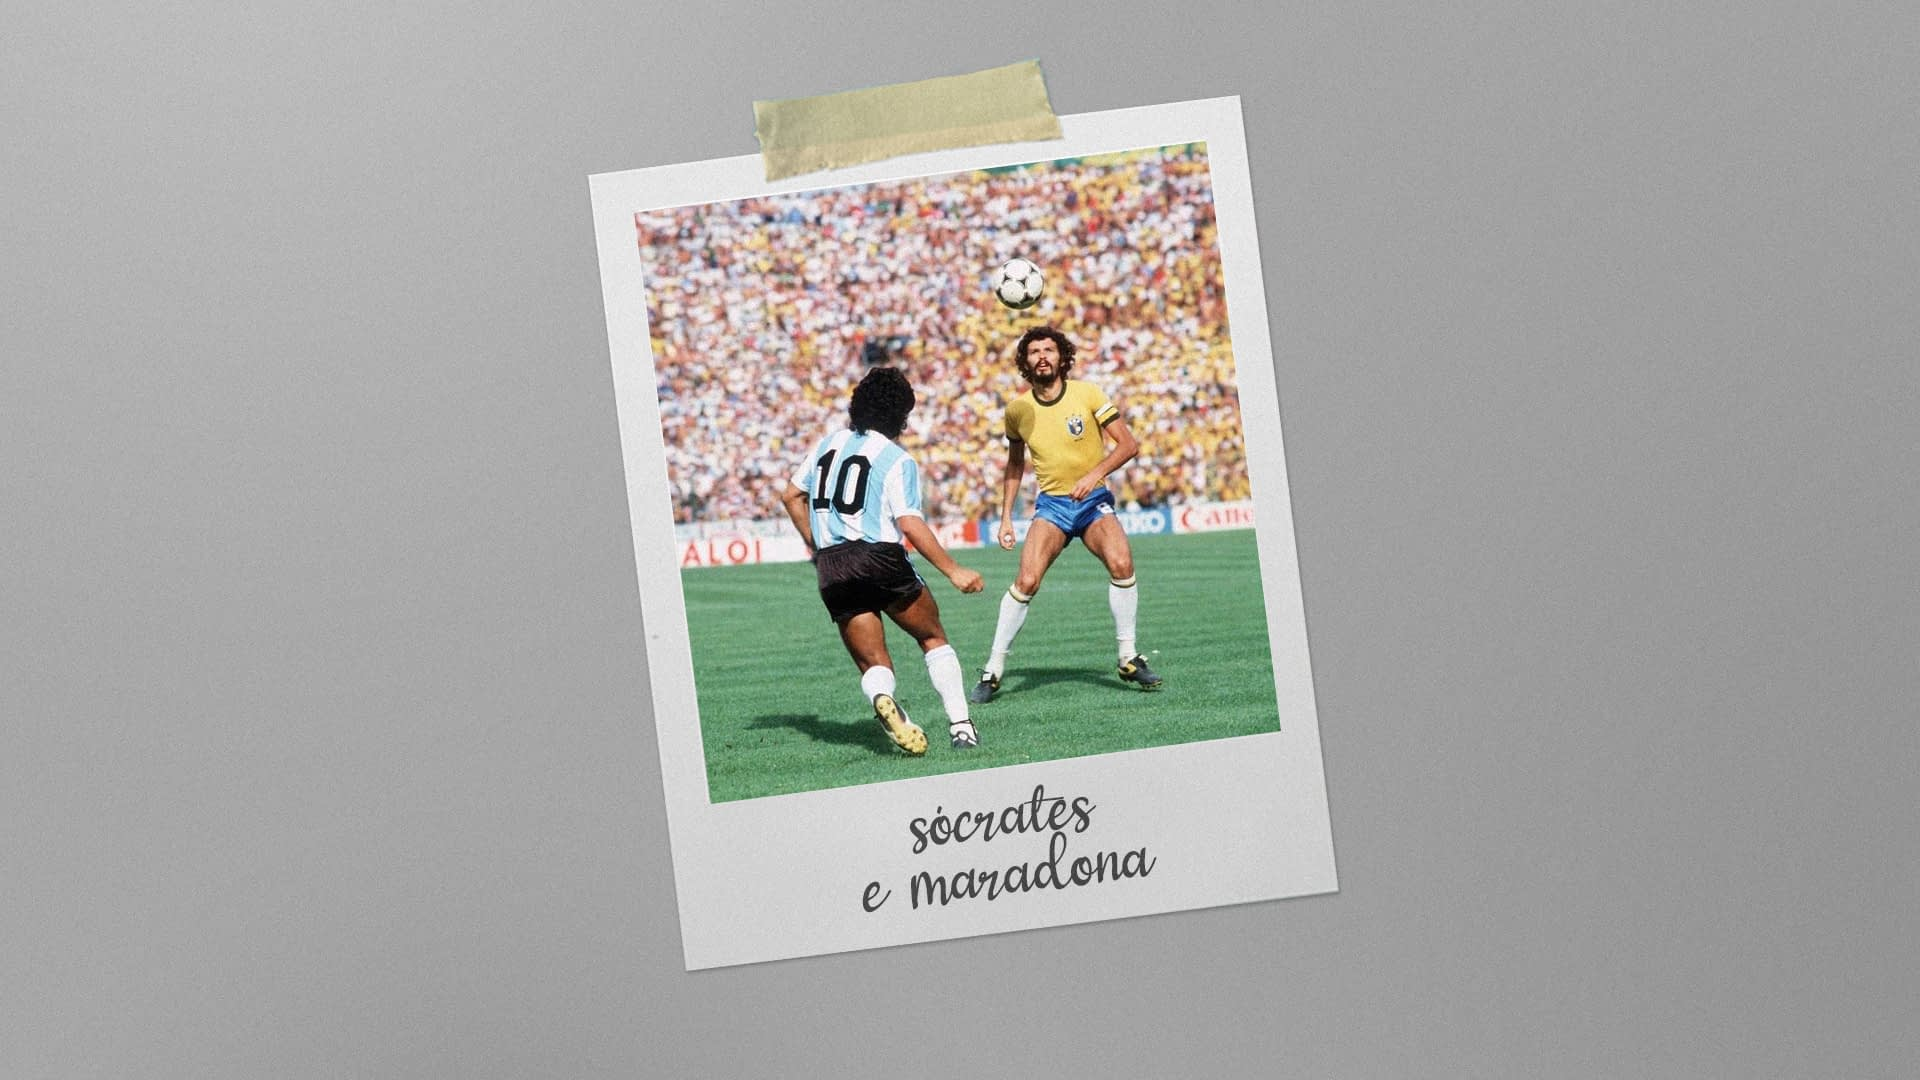 Socrates-e-Maradona-5